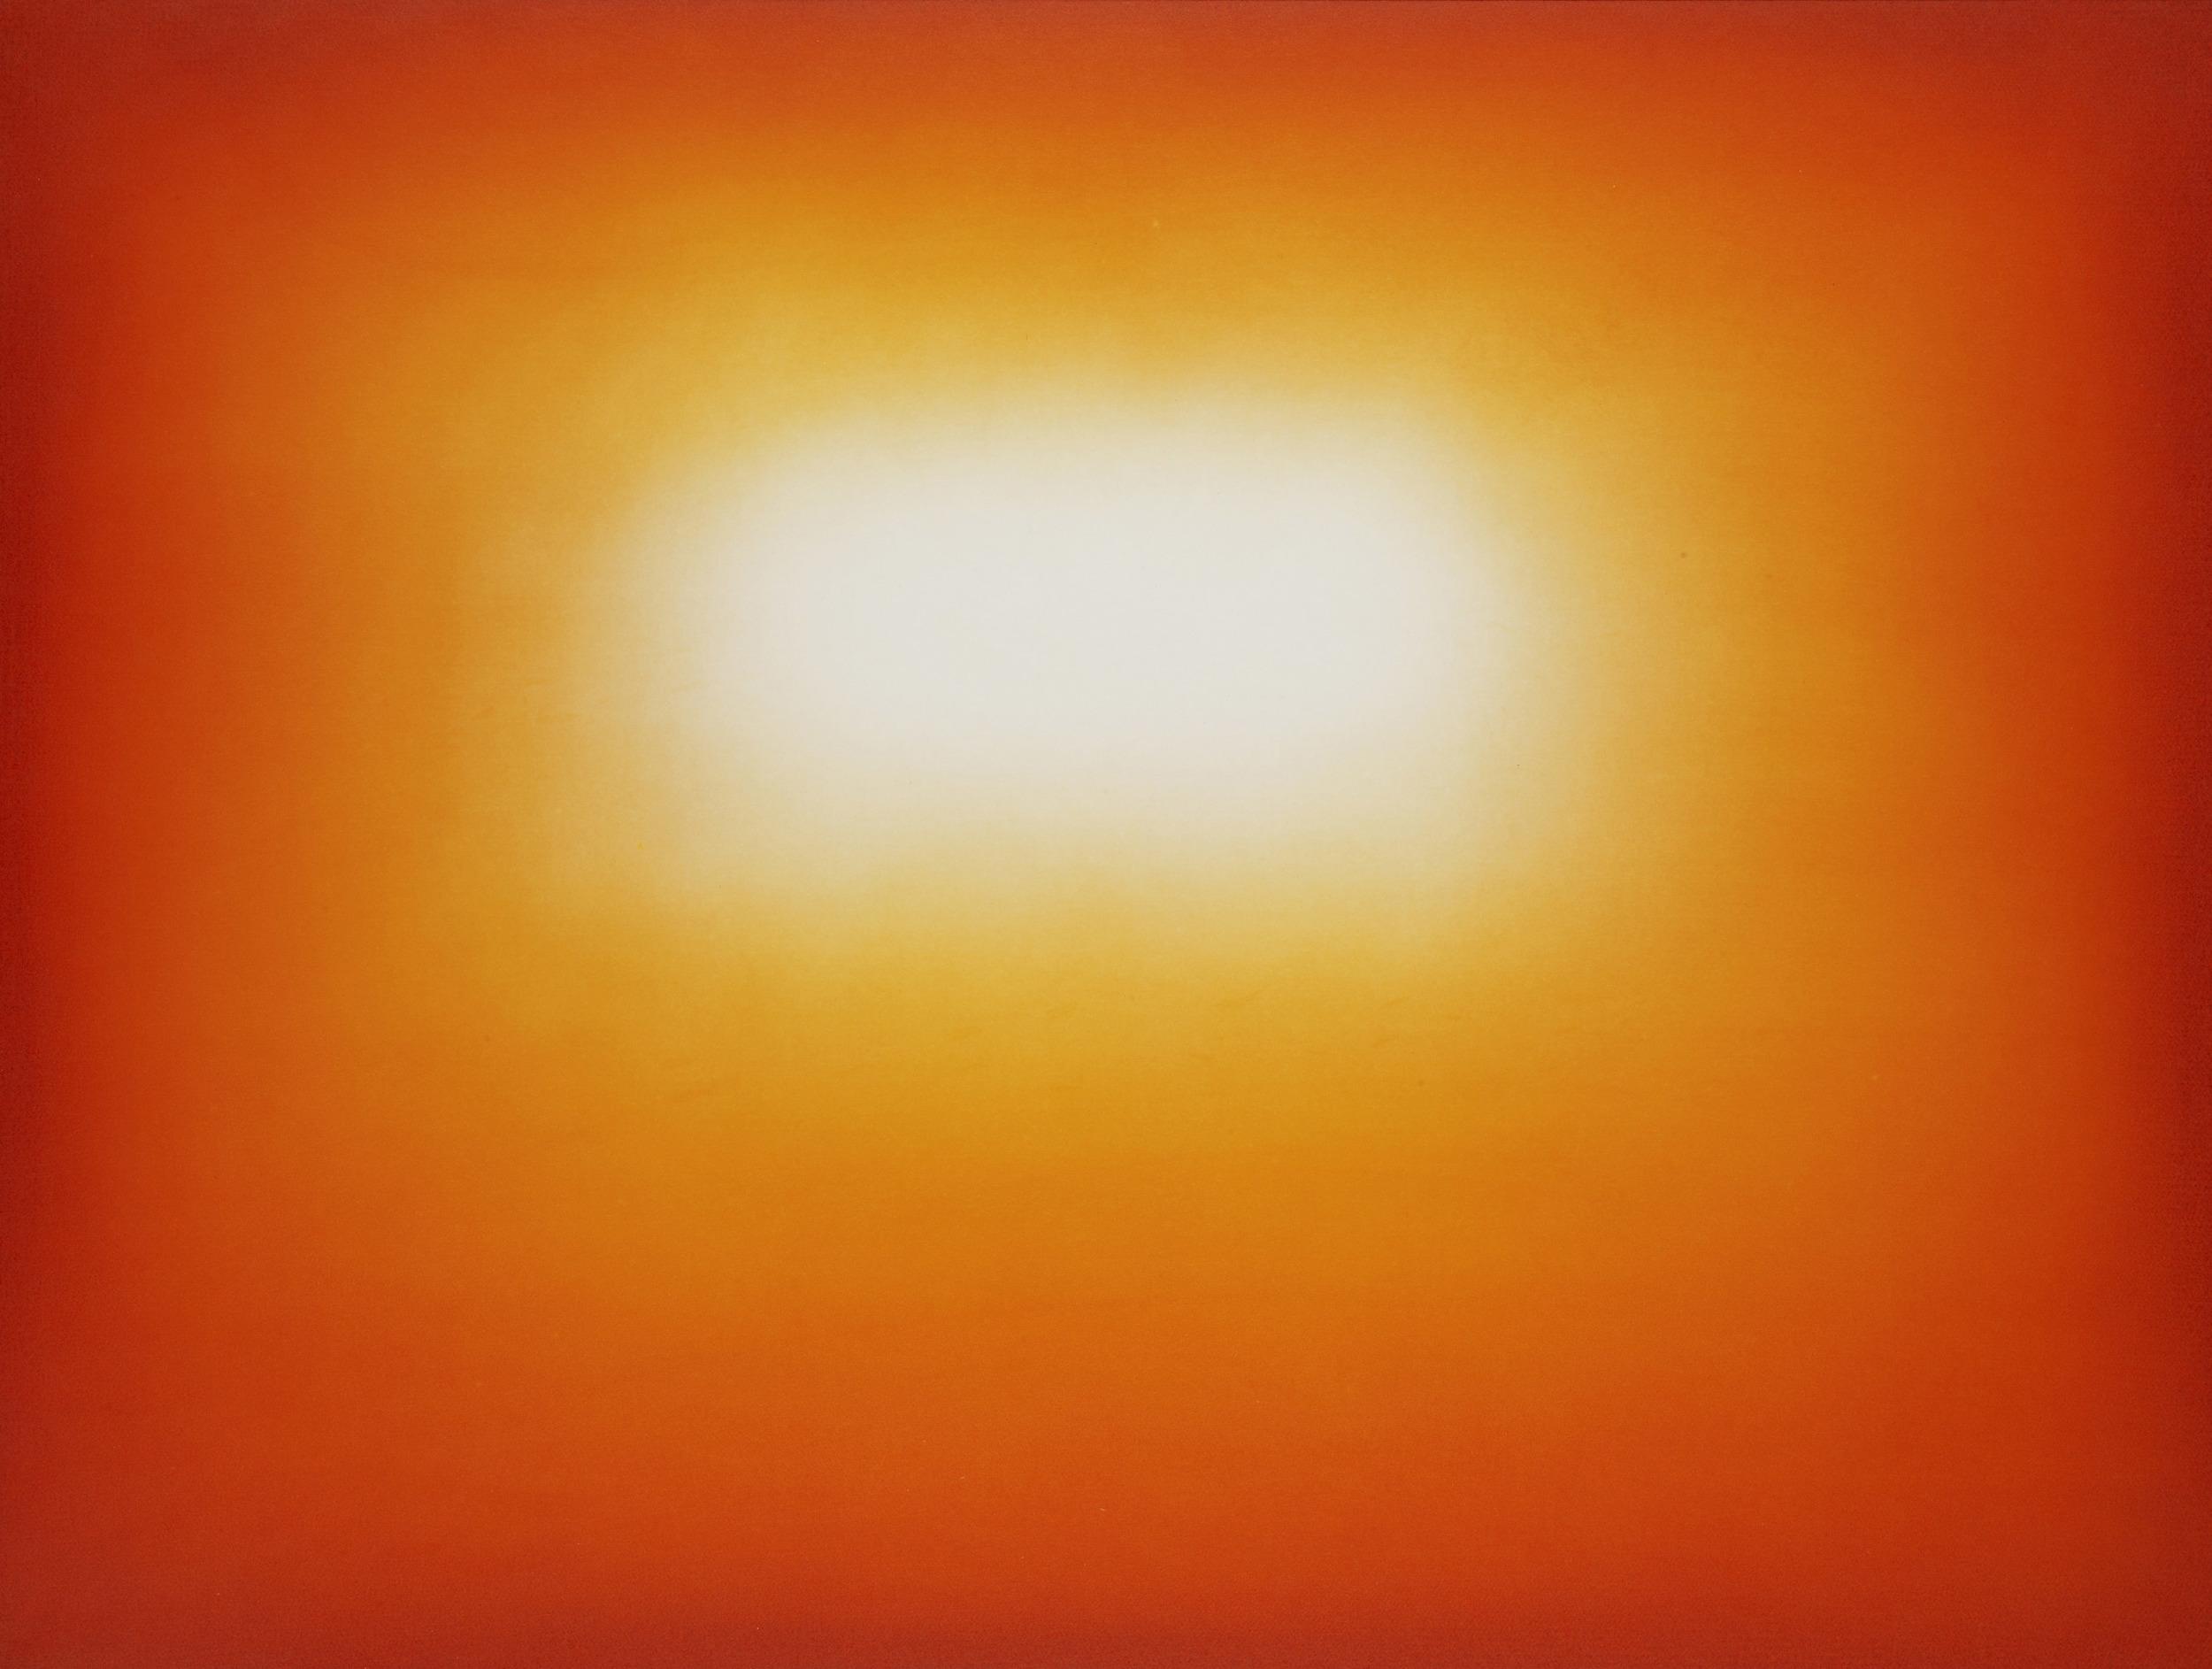 Anish Kapoor  Orange • 2011 Gravura em metal Edição: 39 76.2 x 100 cm